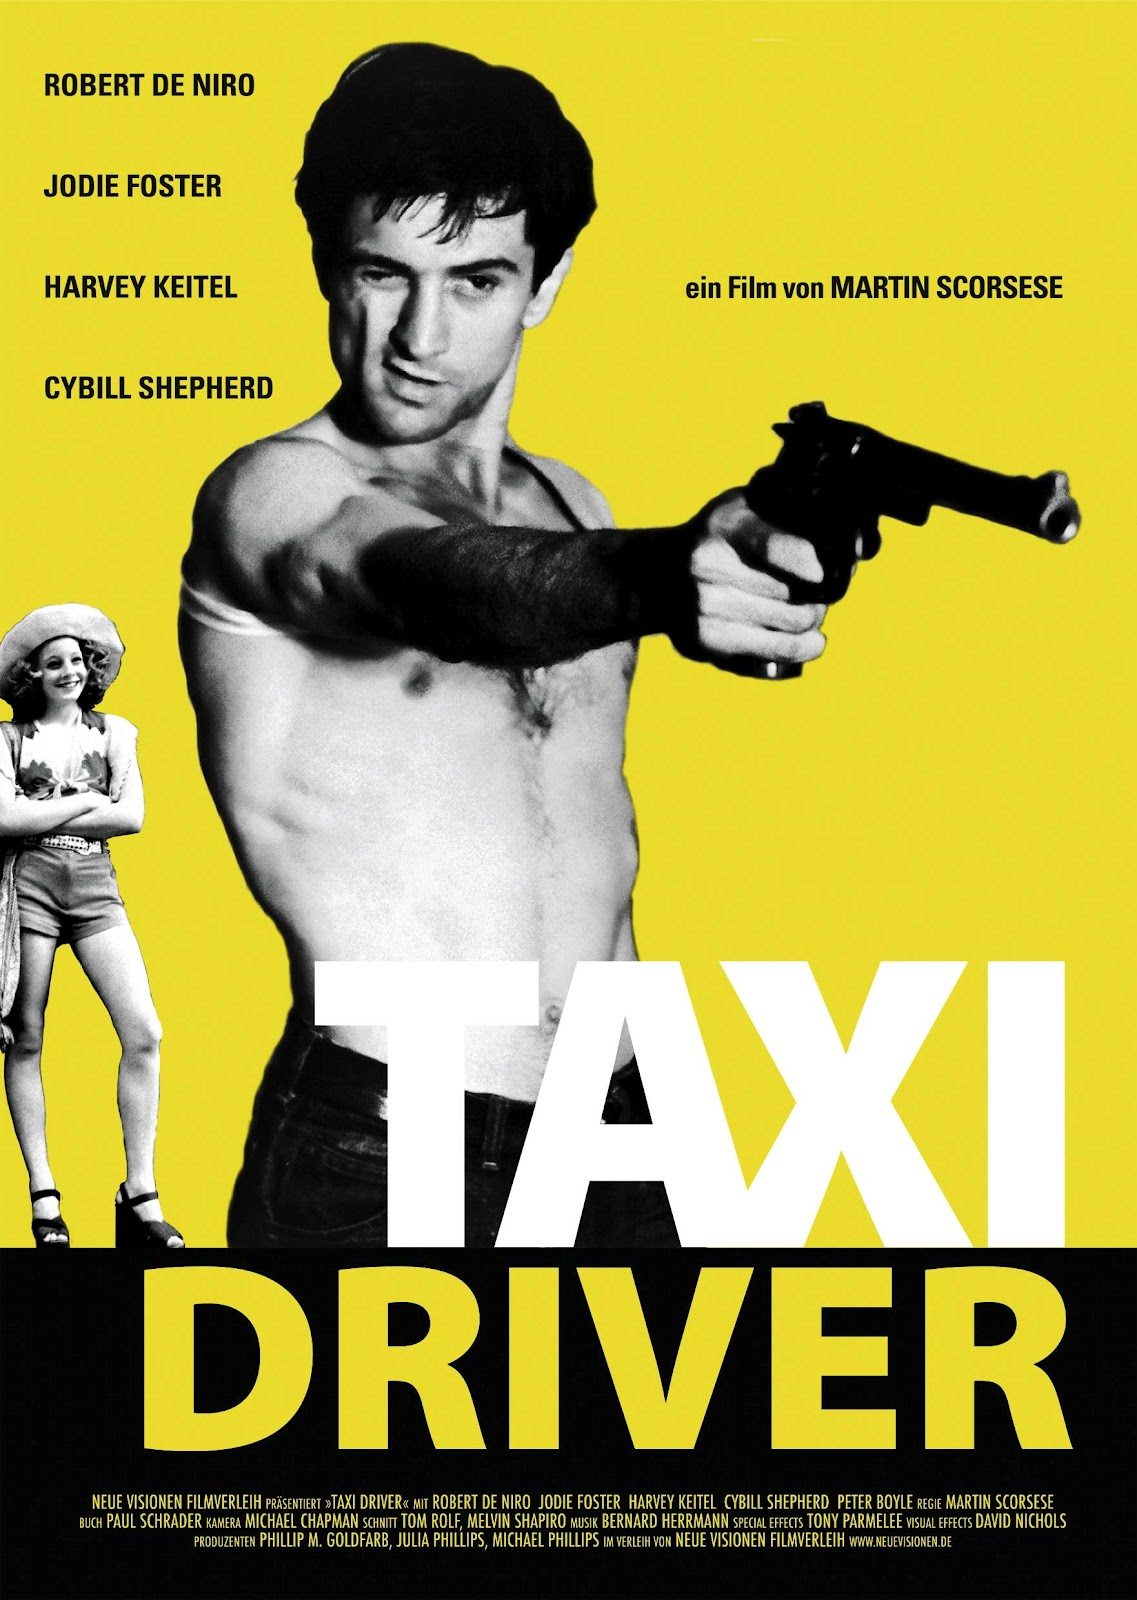 https://4.bp.blogspot.com/-onfFcd-BVC4/T2hpw2KCEJI/AAAAAAAABjI/7P4c5y2PZ34/s1600/Taxi-Driver.jpg